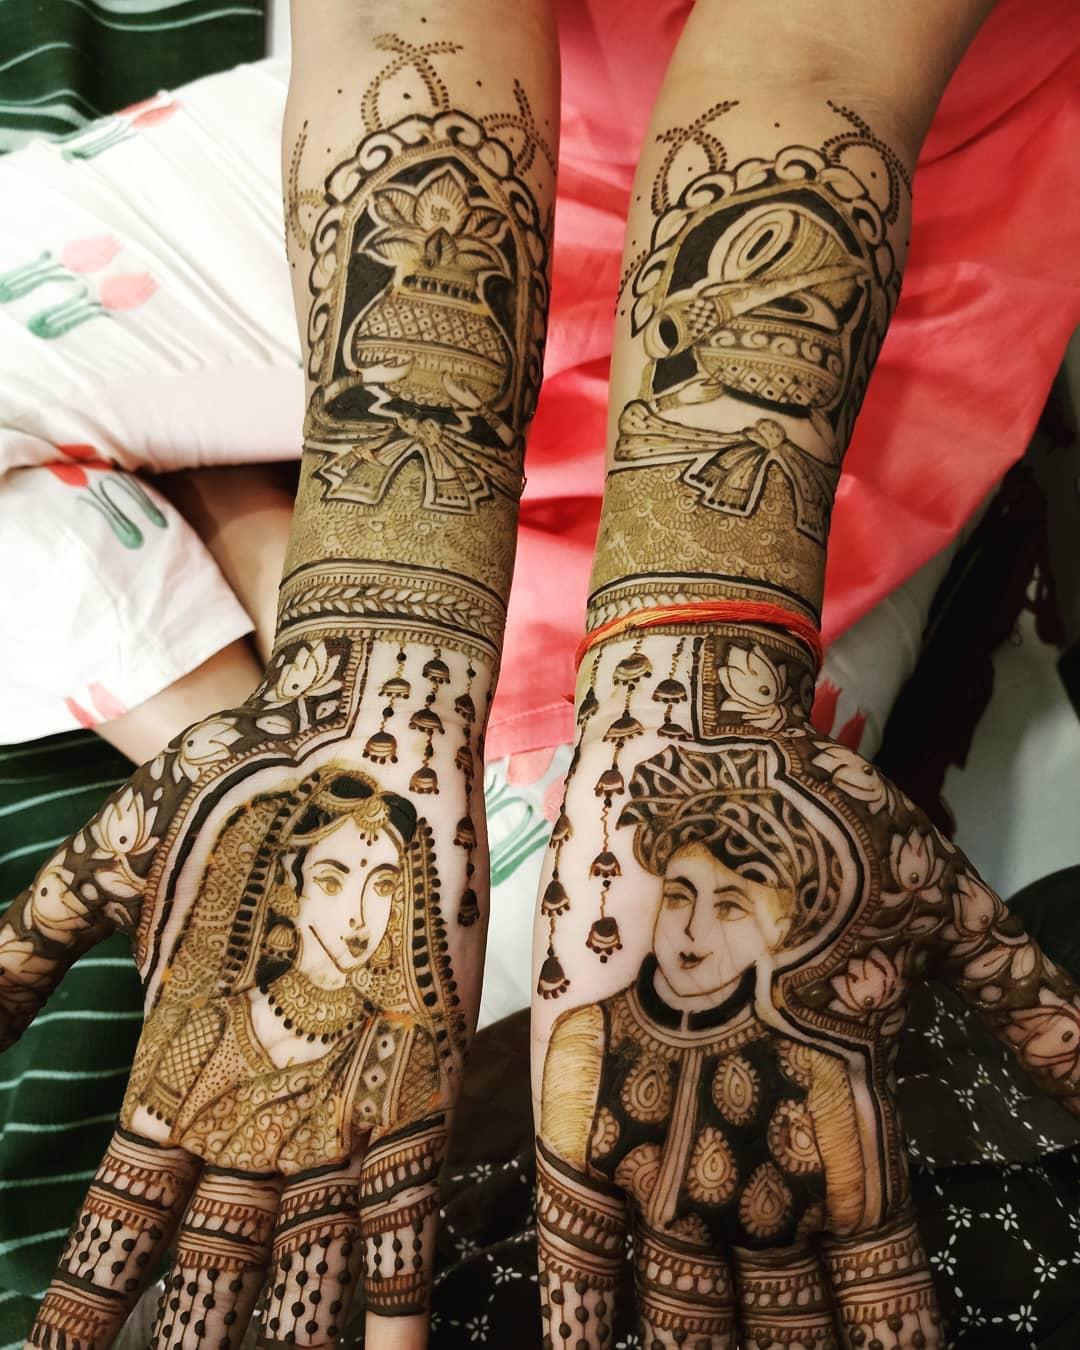 PunjabKesari, मेहंदी डिज़ाइन इमेज,पोर्ट्रेट मेहंदी डिज़ाइन फॉर ब्राइड, Mehndi Design Image, portrait mehndi design image